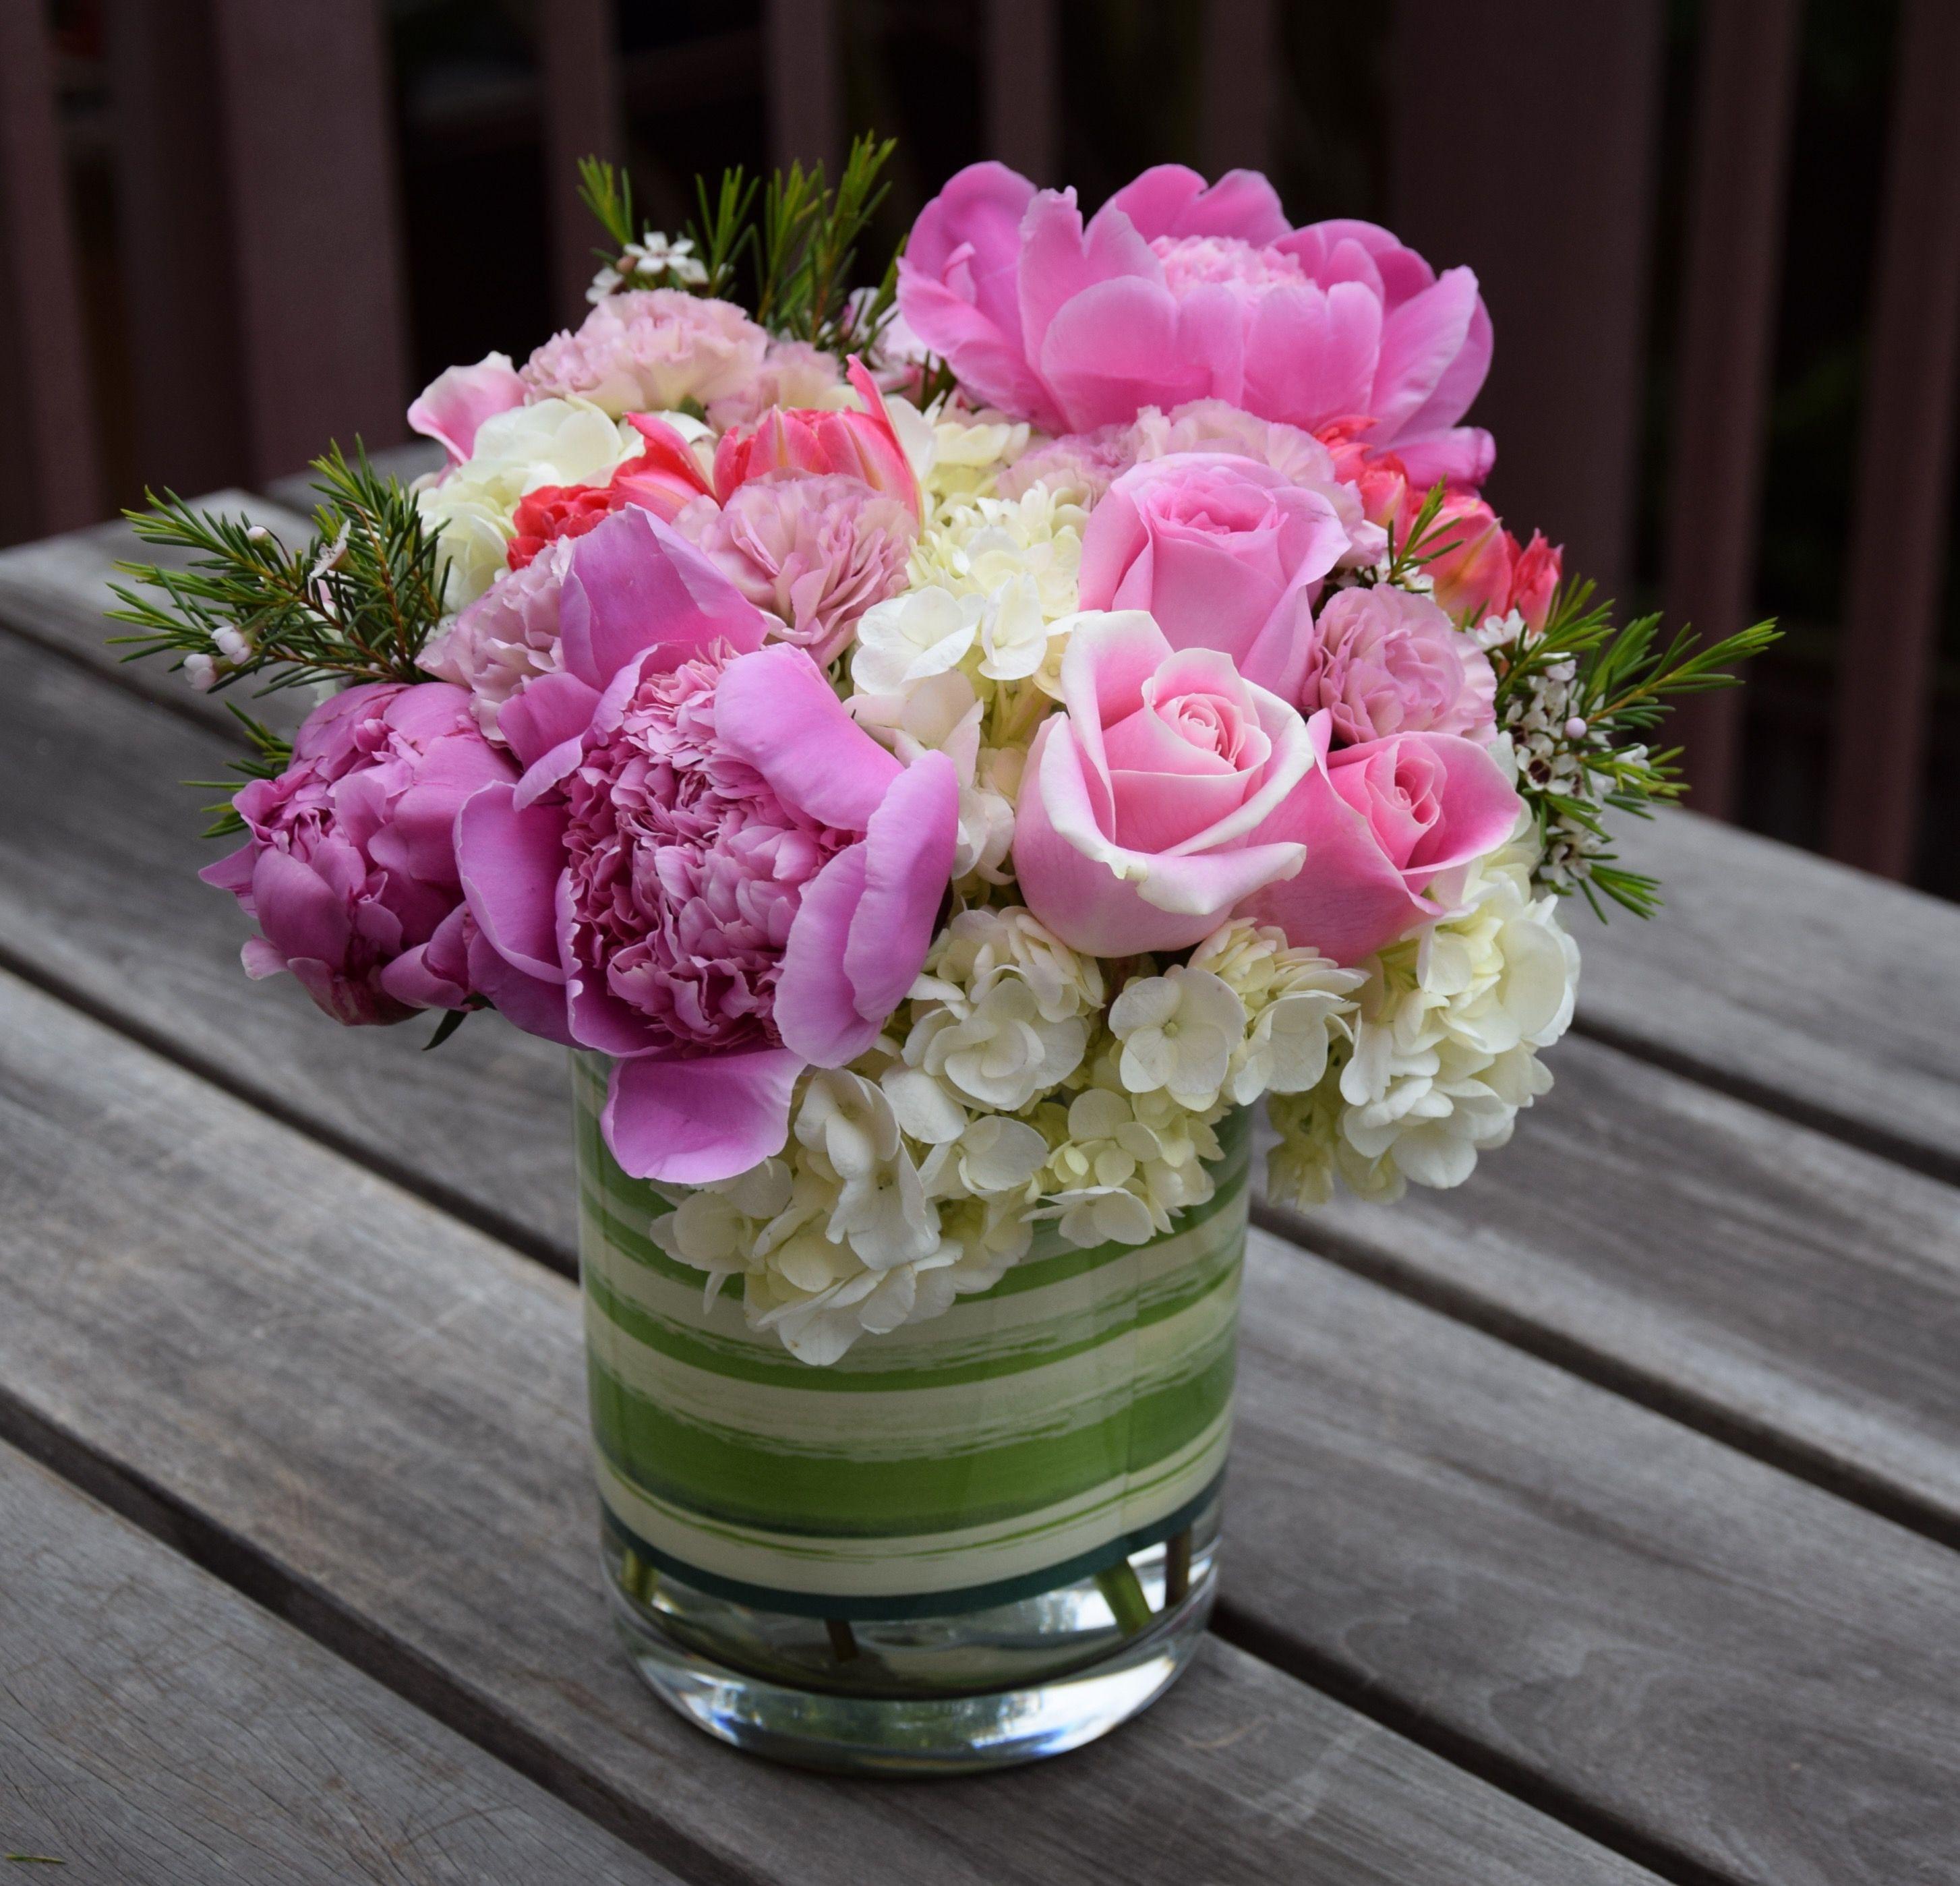 Mother s Day flower arrangement hydrangeas peonies roses tulips